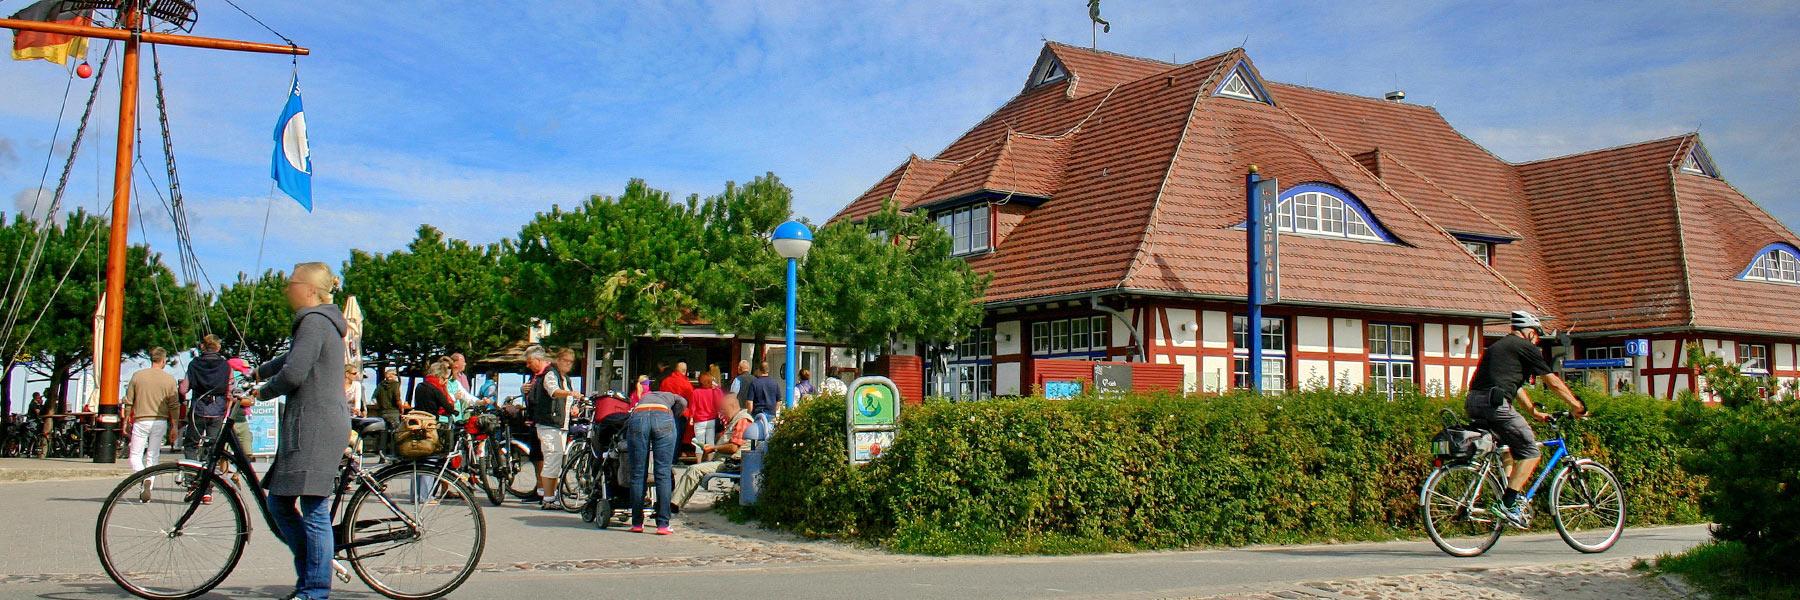 Kurhaus - Fischland-Darß-Zingst